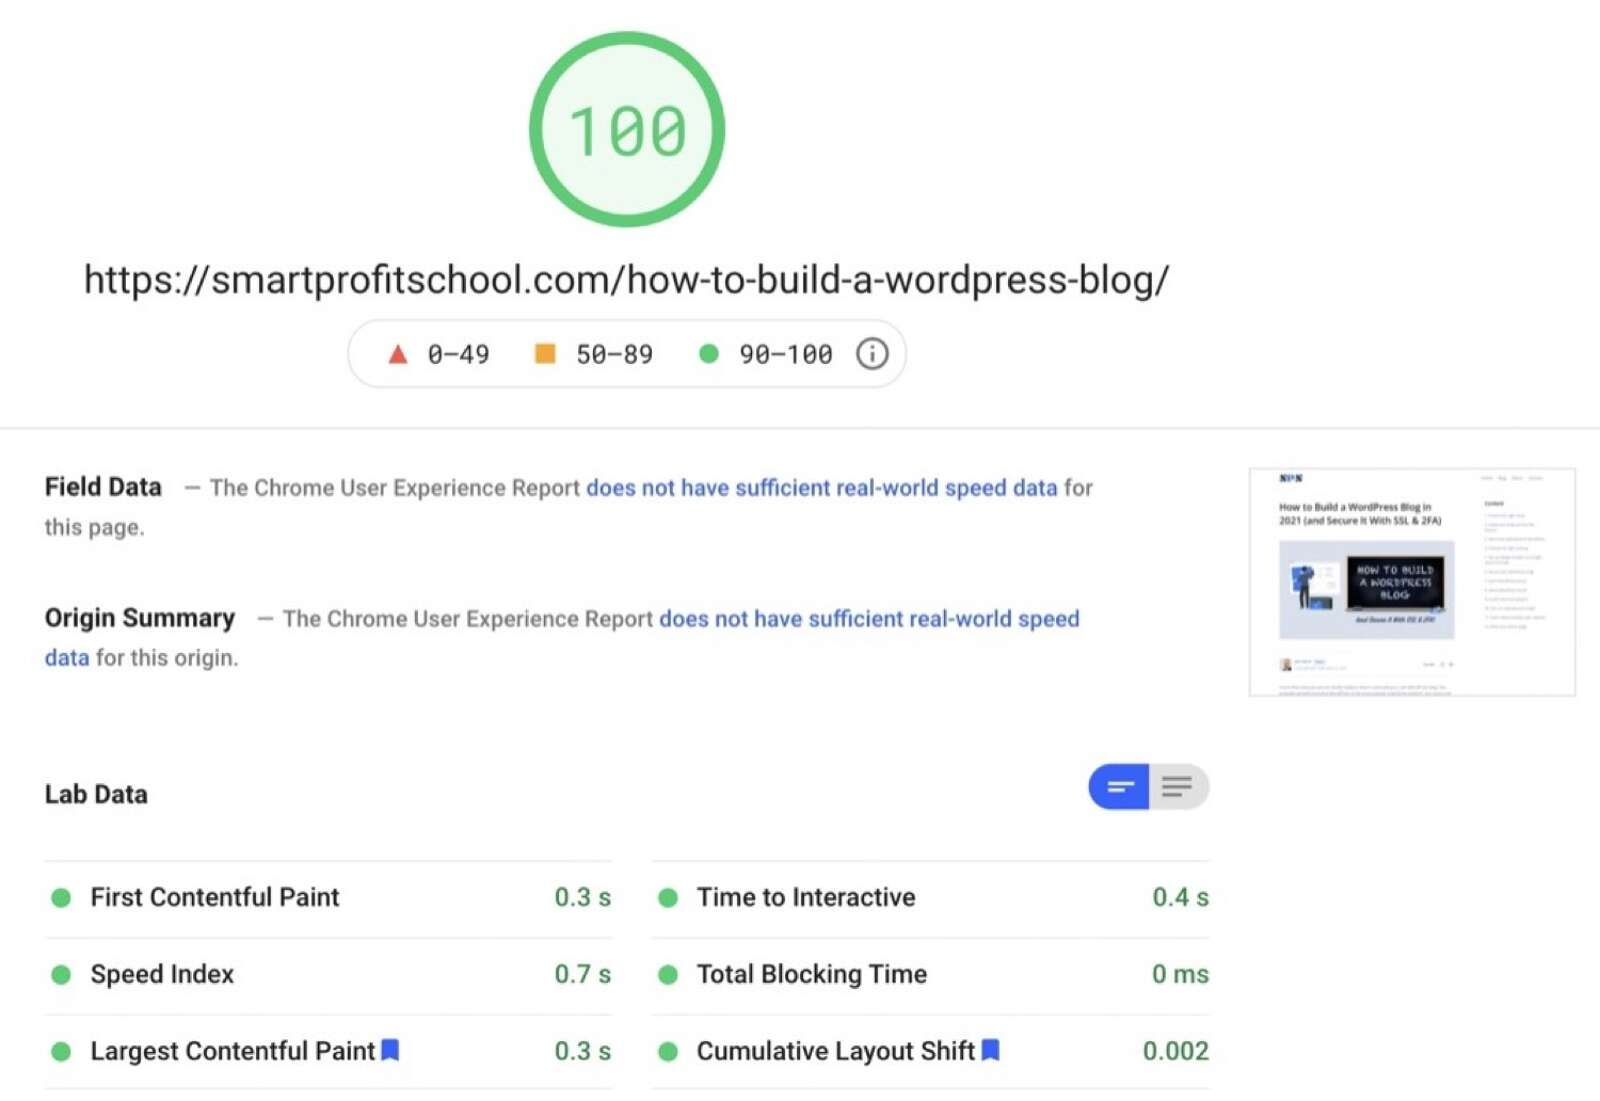 PageSpeed Insights Results for smartprofitschool.com